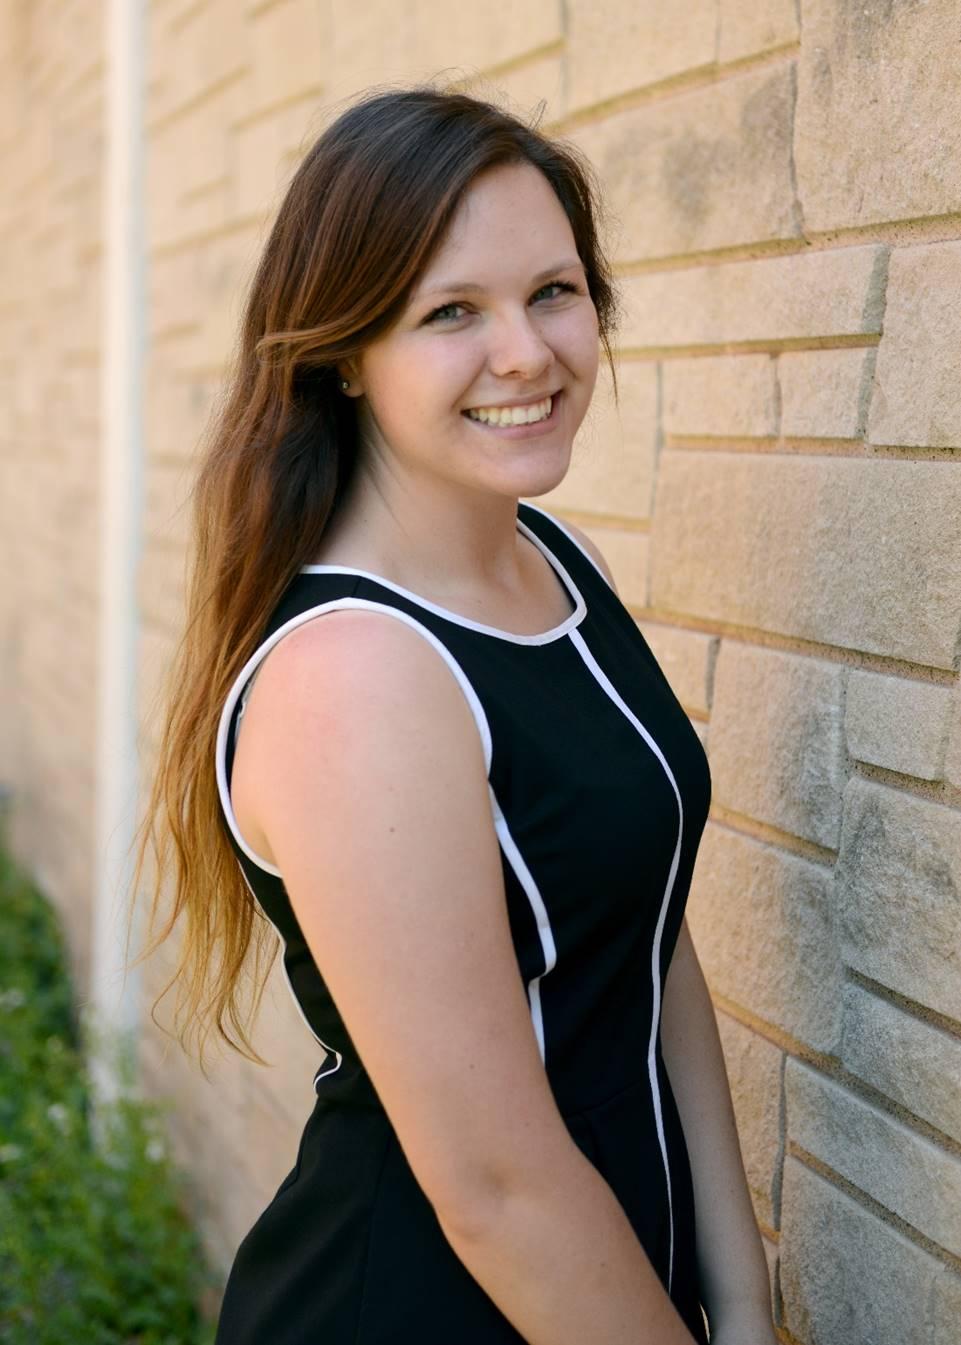 Erin Blackford - Interning: UMC of Anoka UMC with Rev. Bill EavesSchool: University of Wisconsin—River FallsHome church: Excelsior UMC